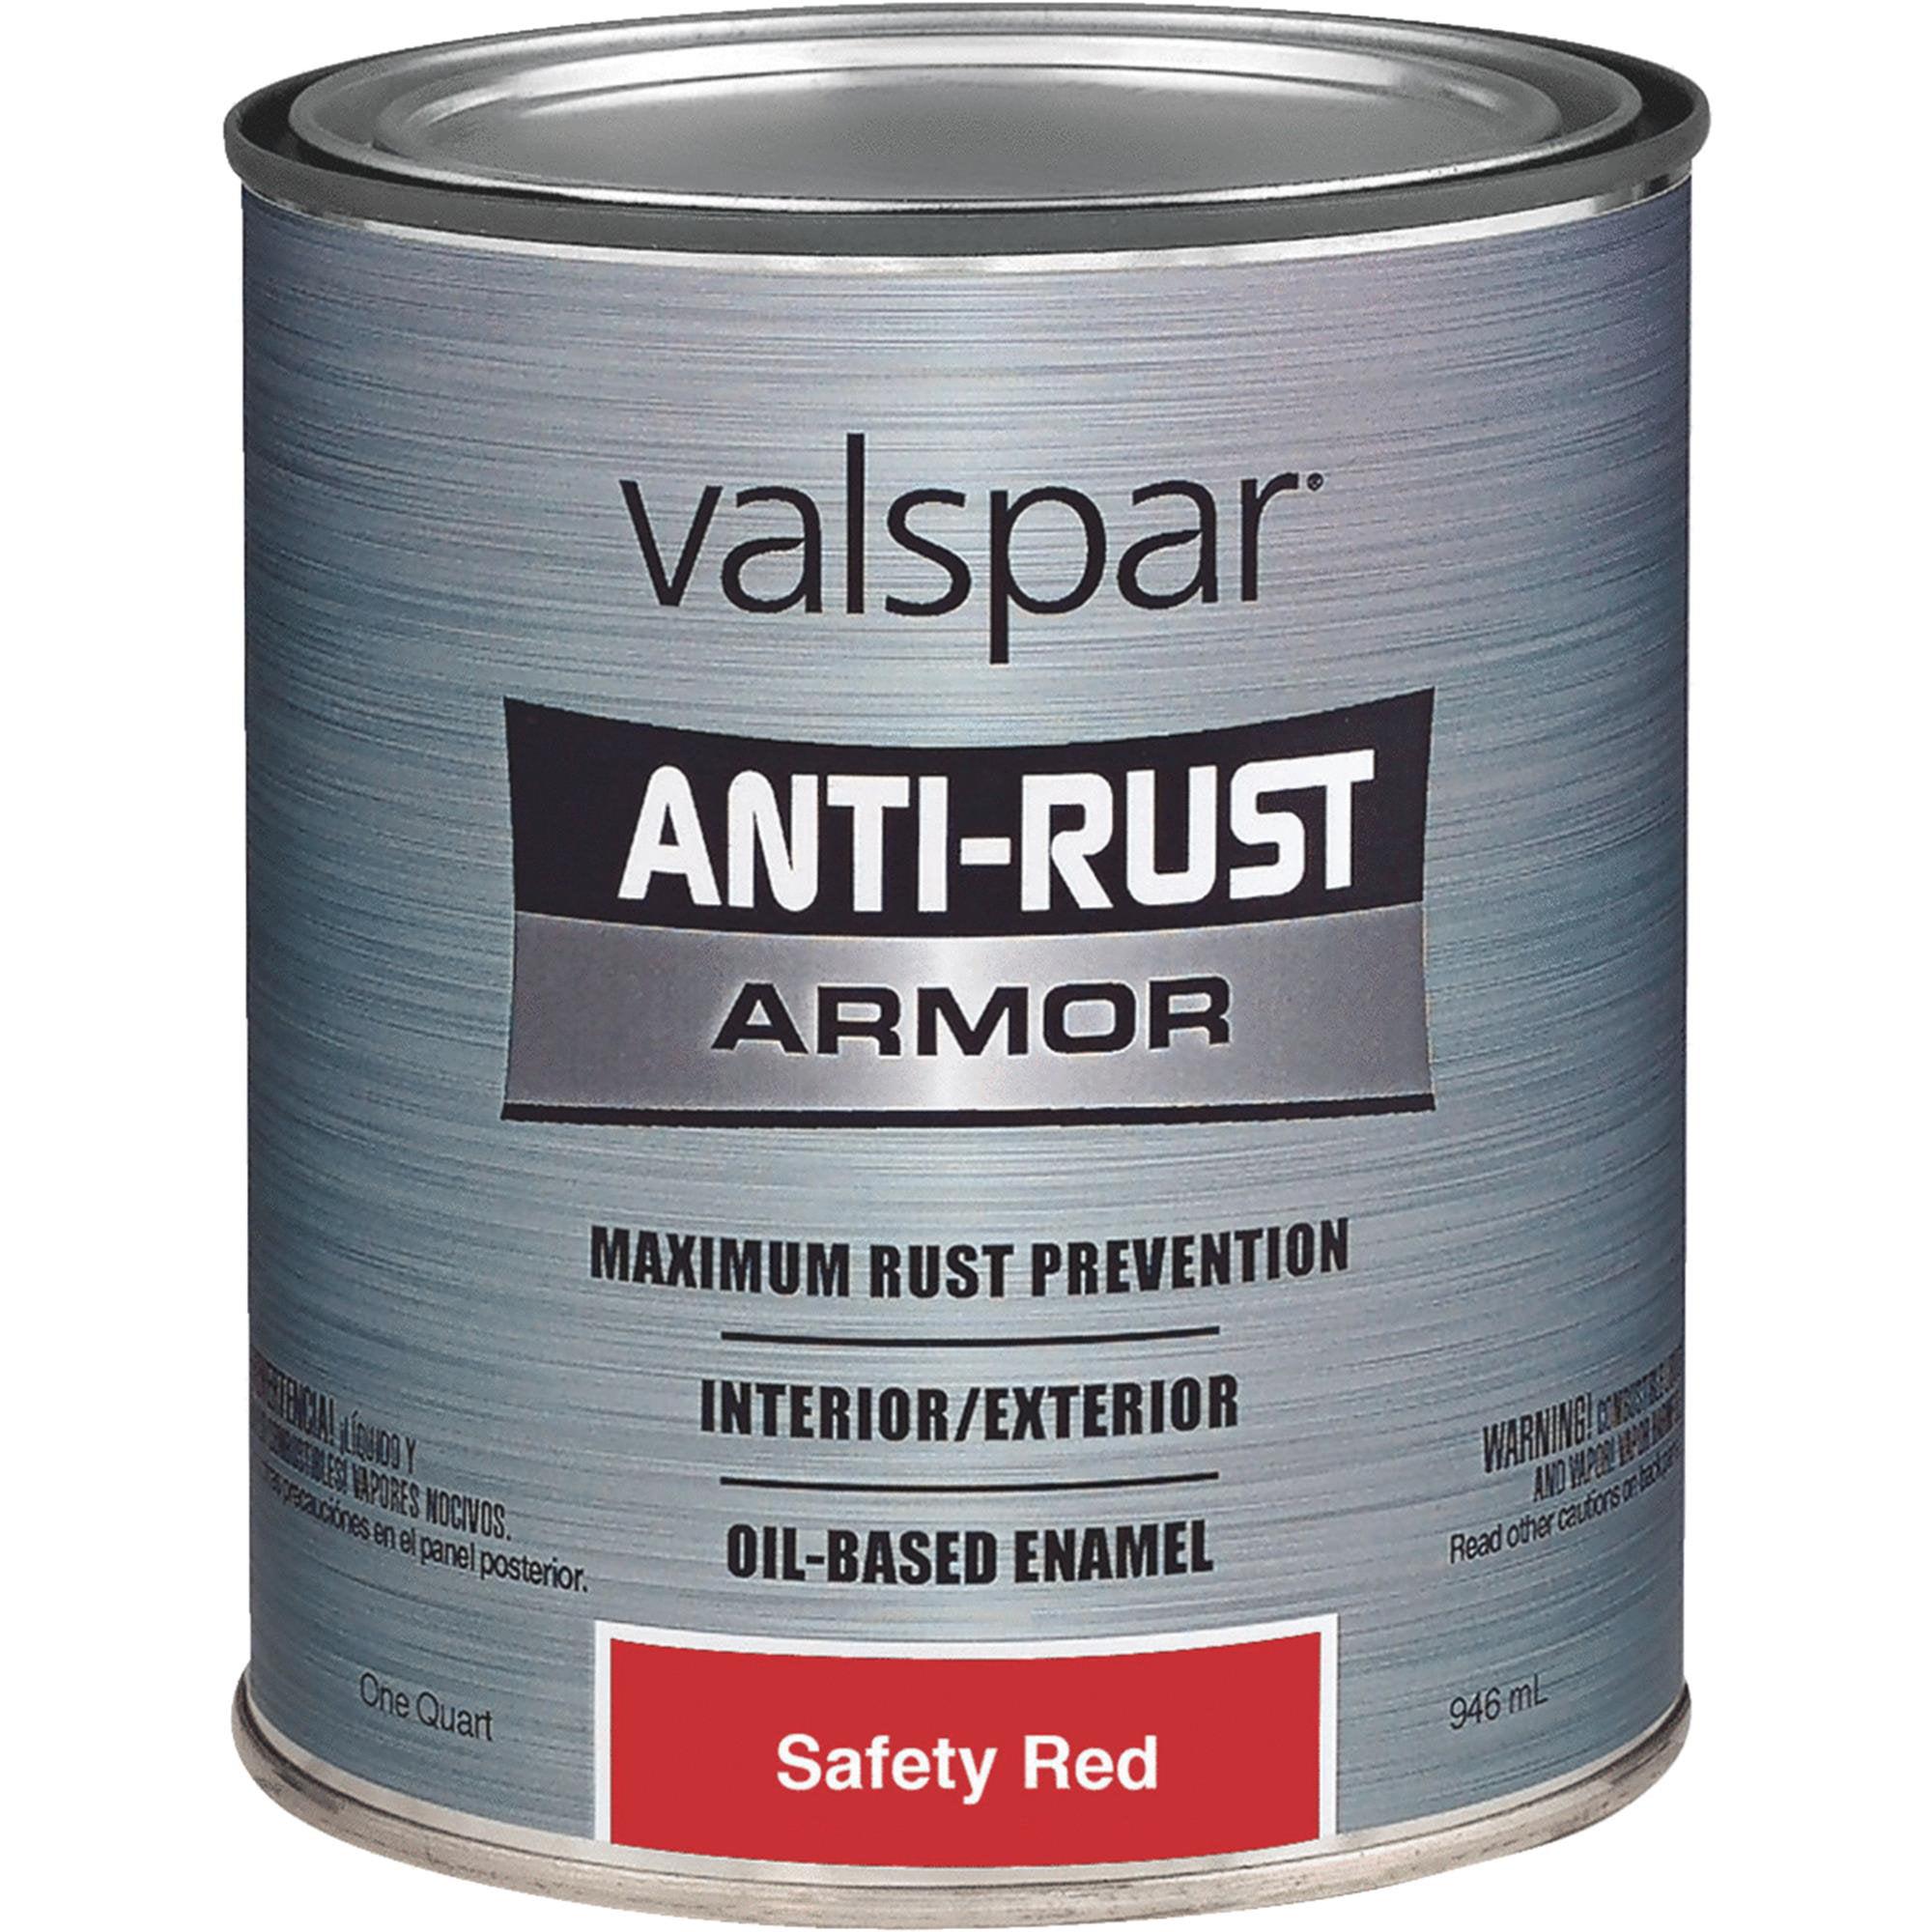 Valspar Anti-Rust Armor Safety Color Rust Control Enamel